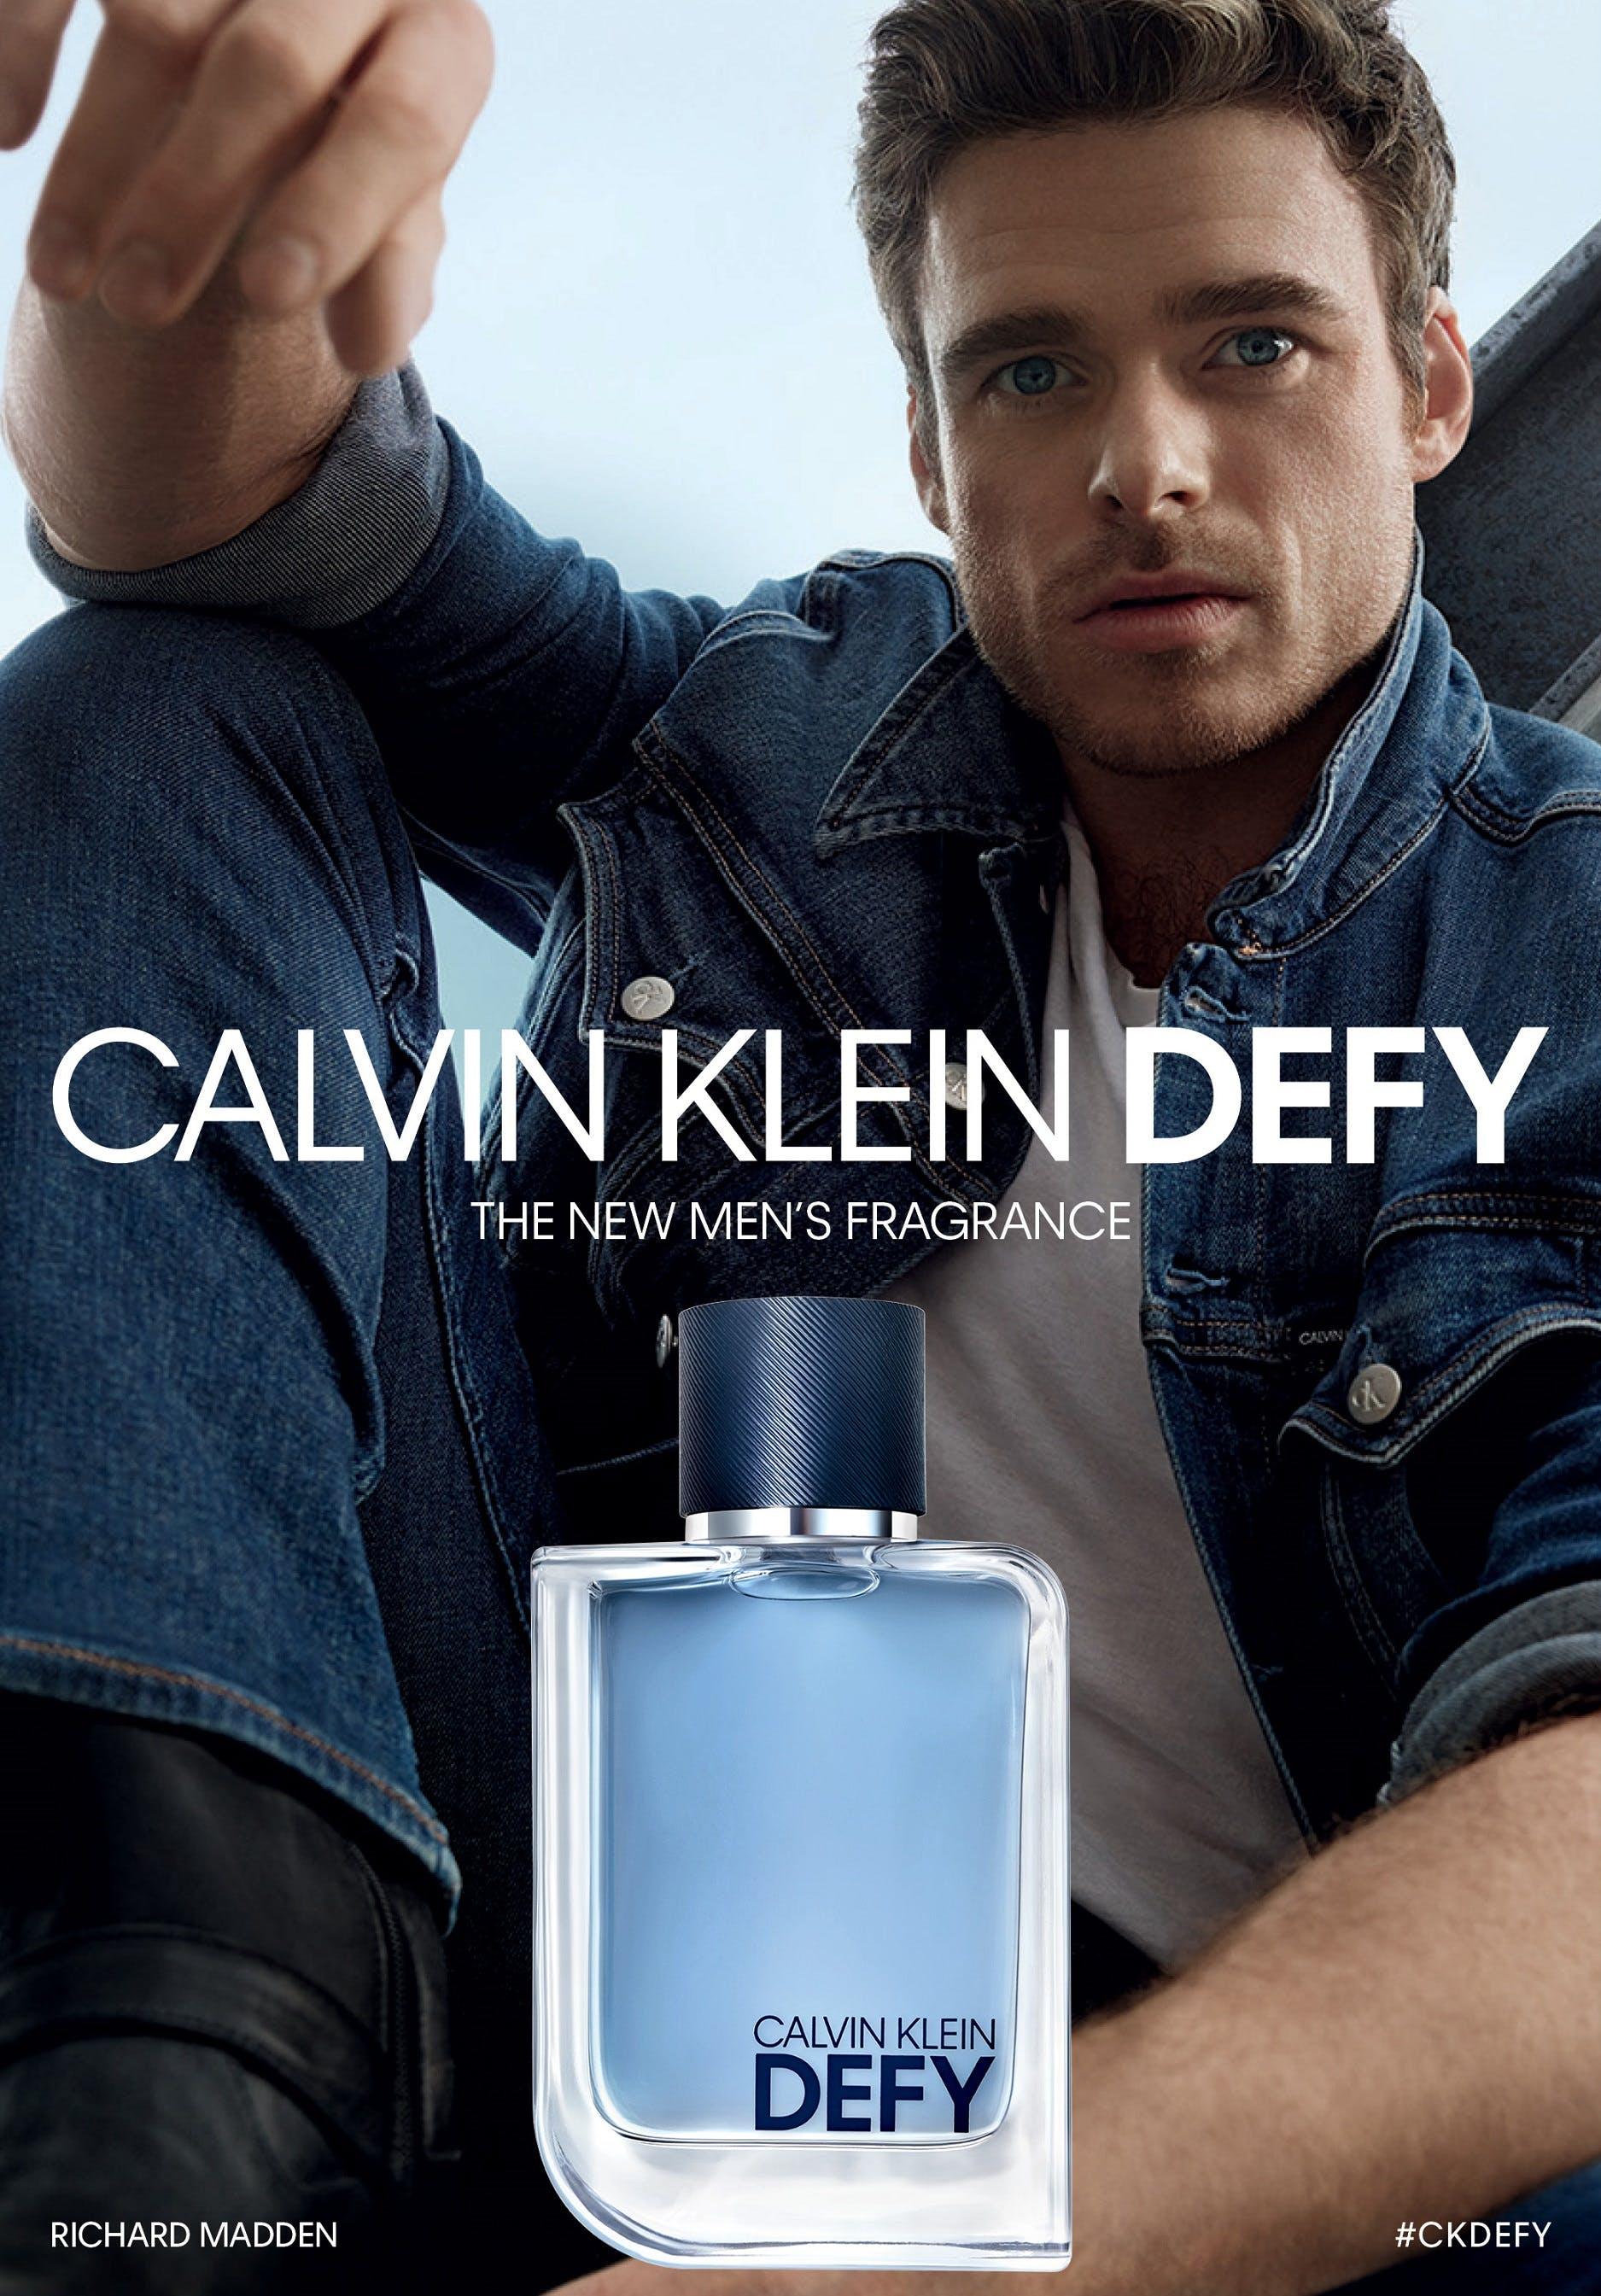 Richard Madden Defies The Odds For Calvin Klein S New Fragrance Eternals Actor Defy